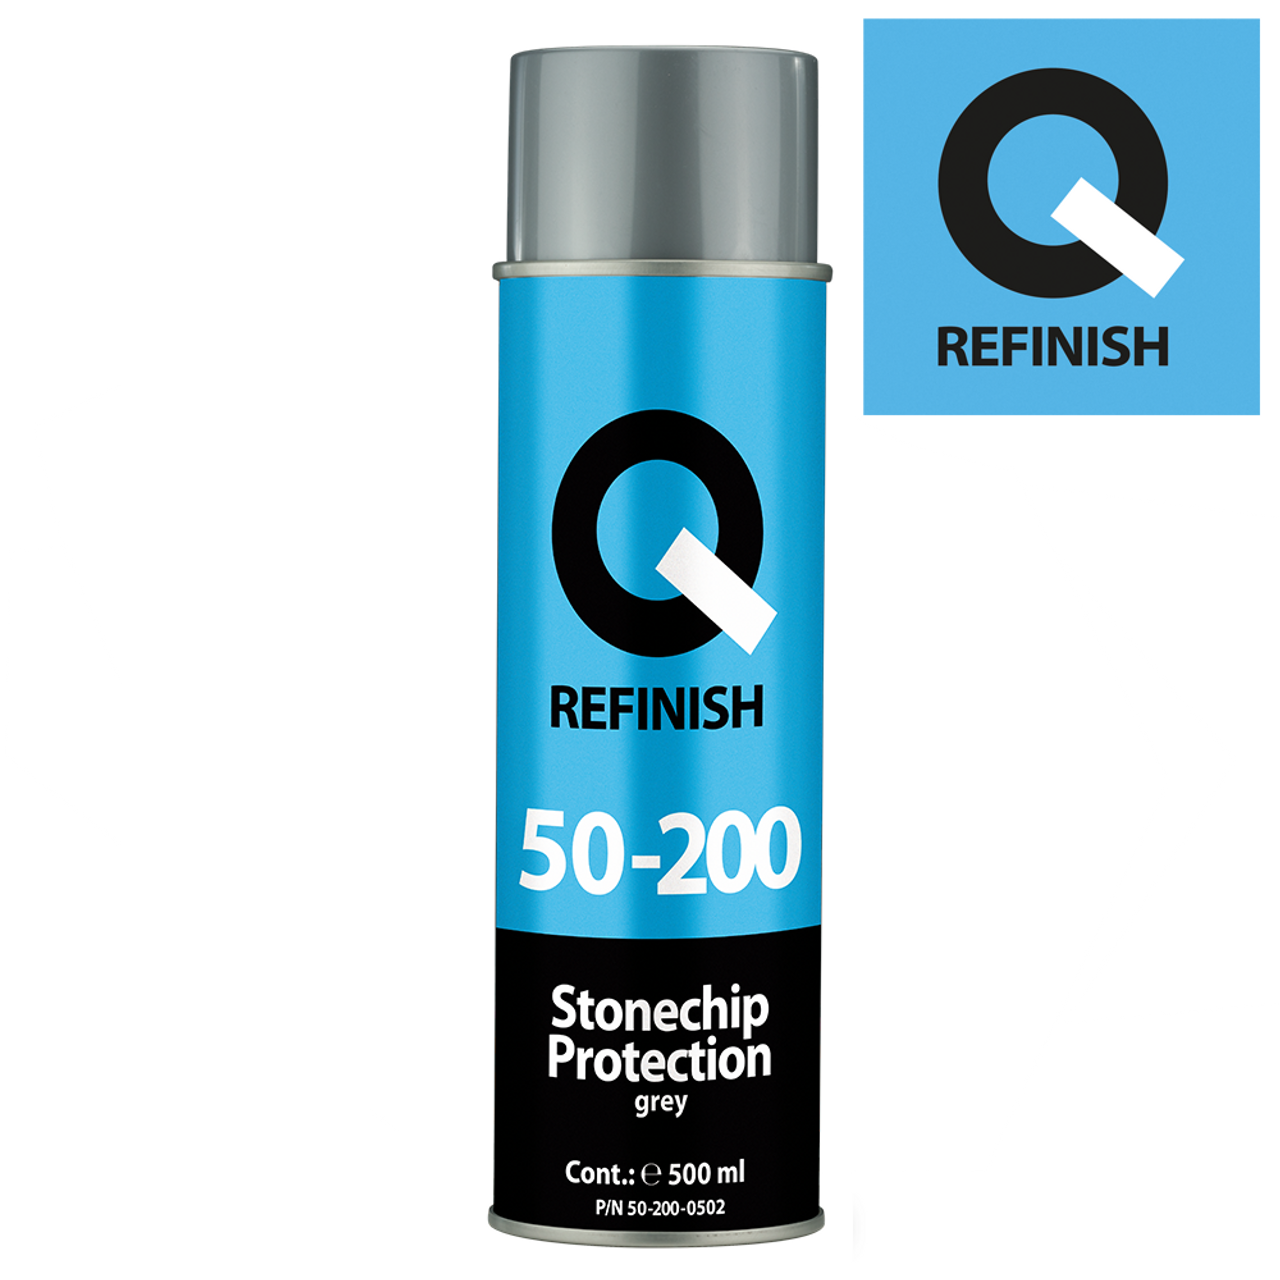 Q Refinish Stonechip Protection 500ml Aerosol